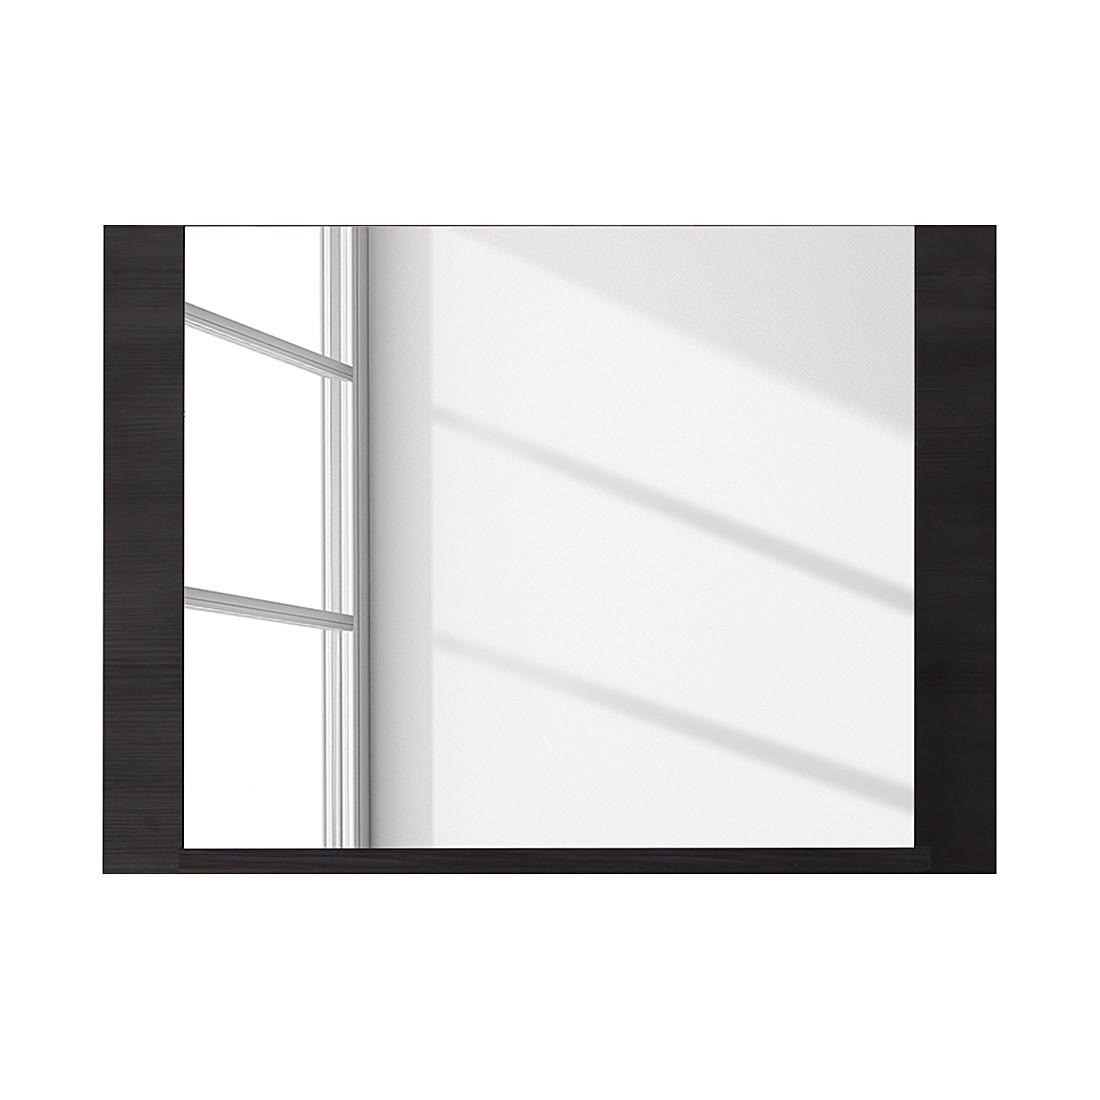 EEK A+, Miroir mural Bigio - Imitation frêne gris, Fredriks